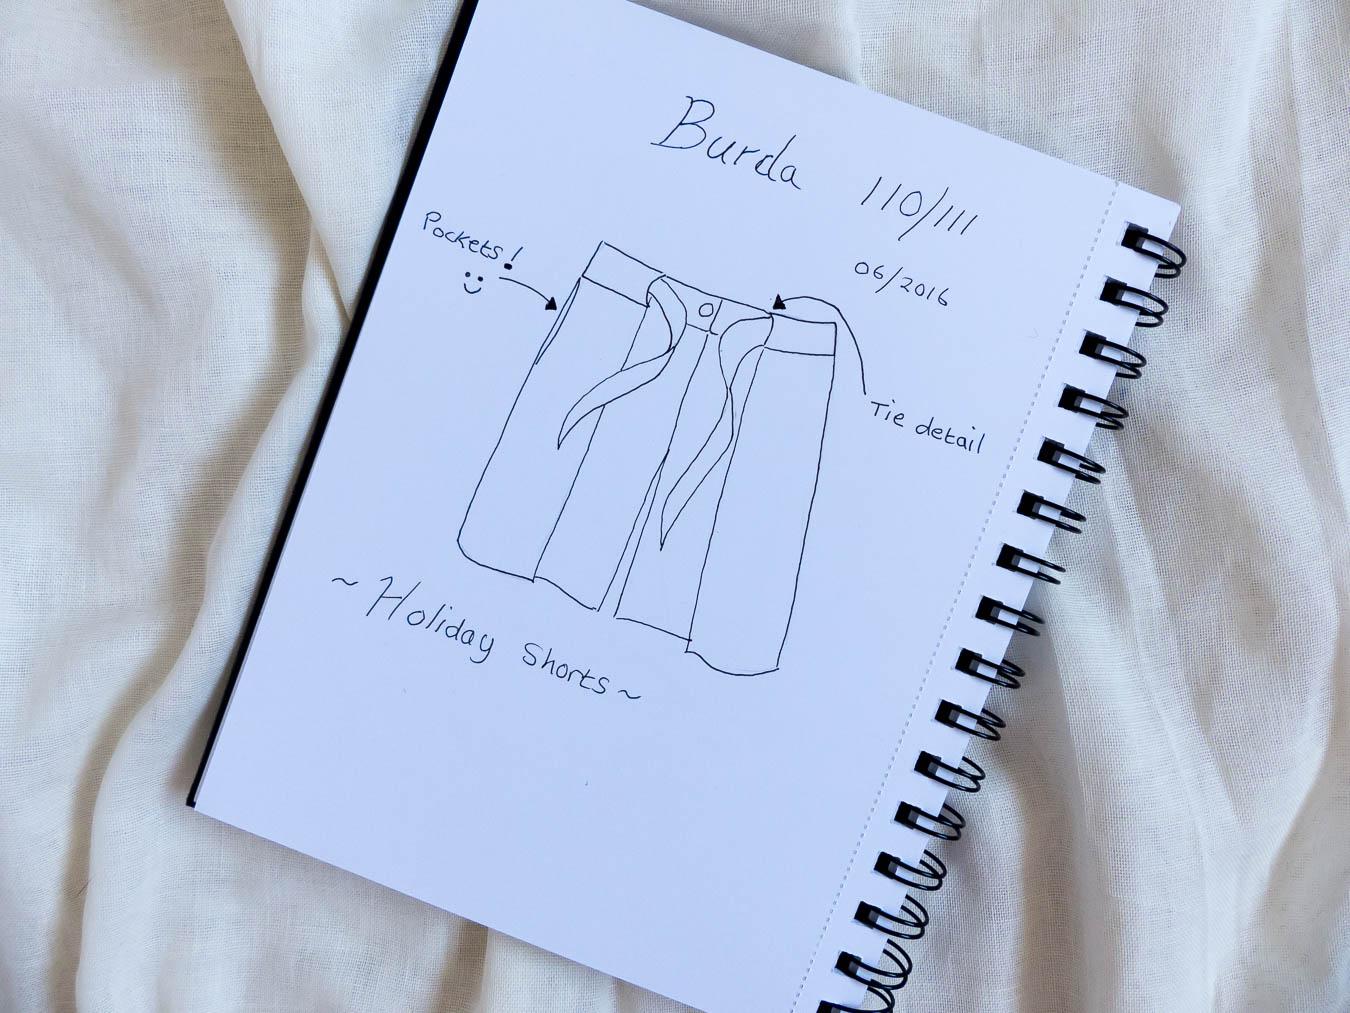 Burda Style Shorts sketch